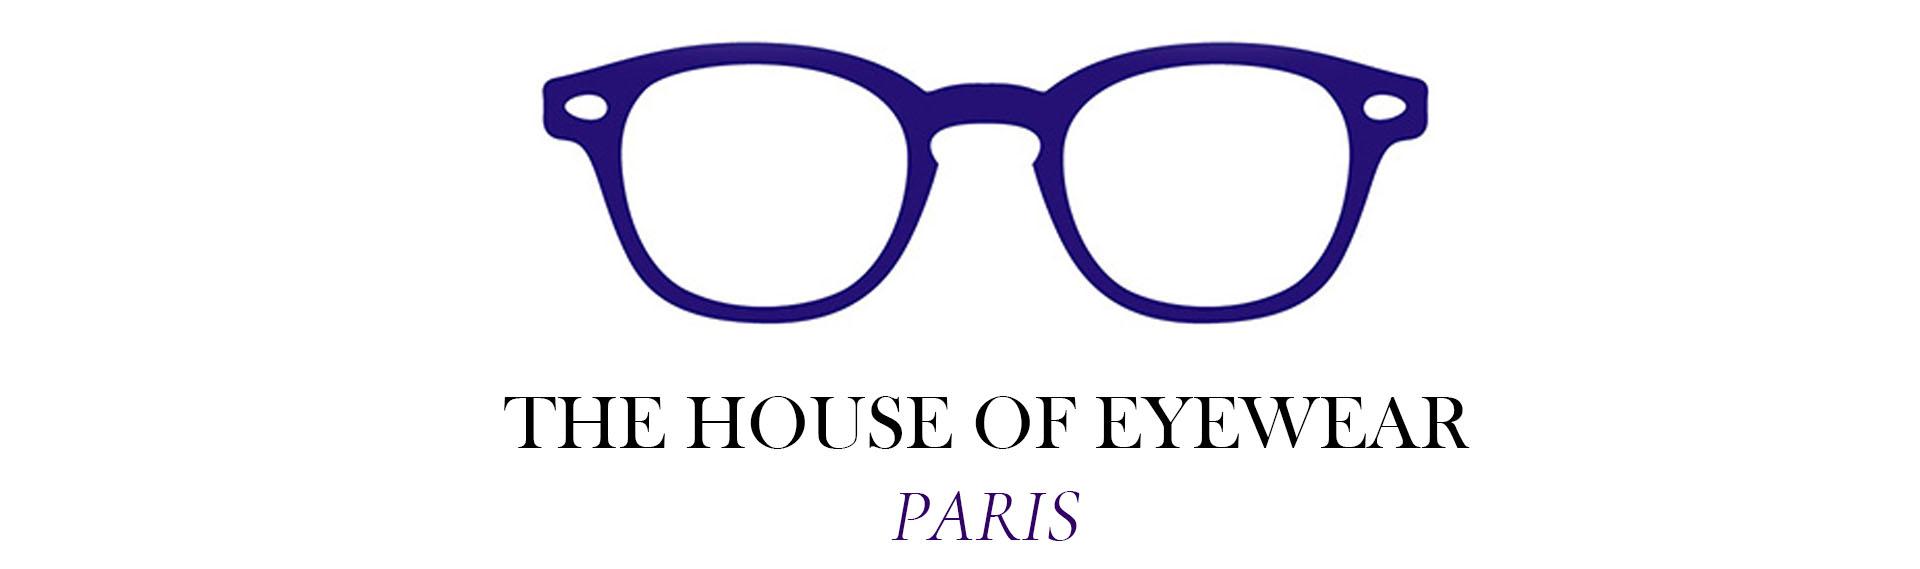 Logo de the house of eyewear